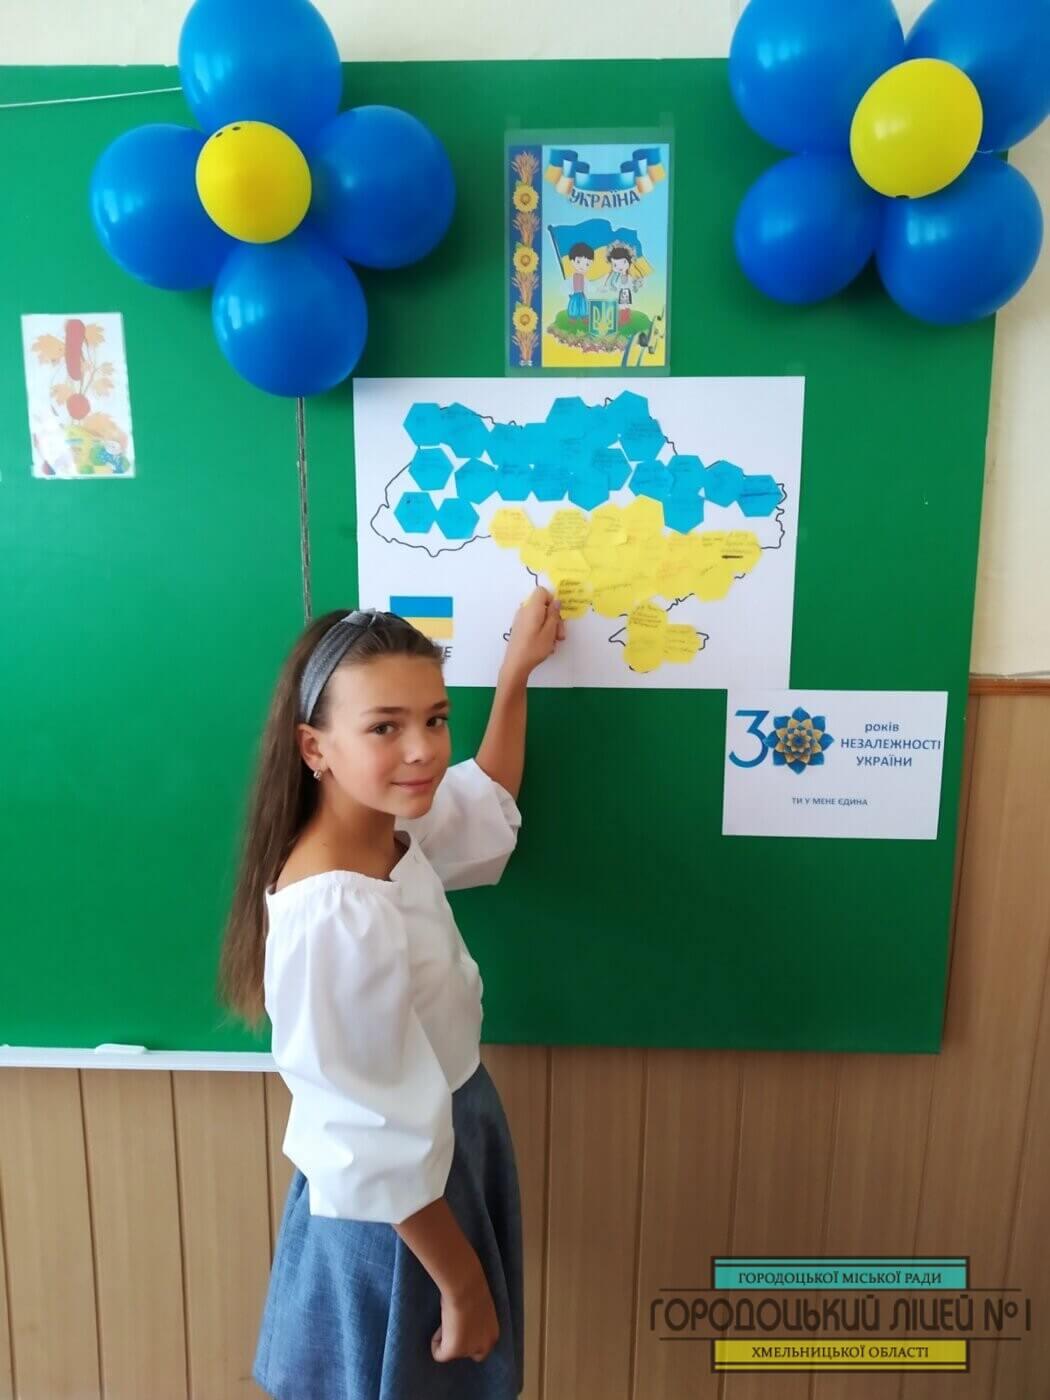 img b077fad1f754cdb38c0d3842473e519d v 1050x1400 - Тридцятиріччя незалежності України